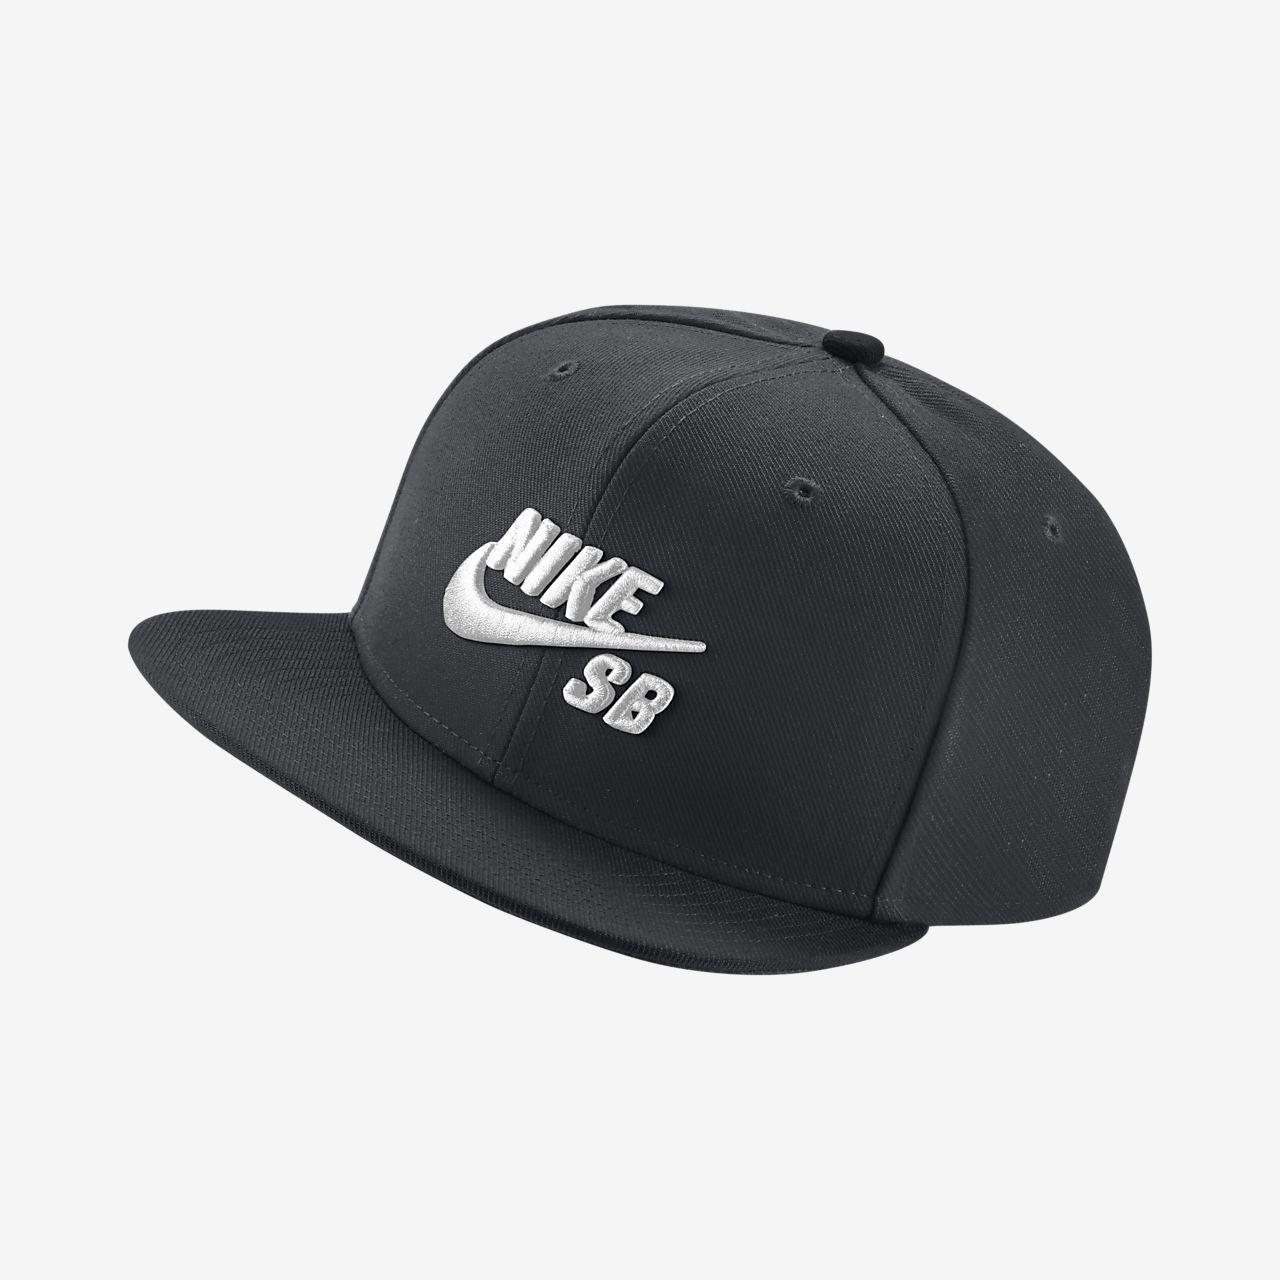 Nike SB Icon 可调节运动帽